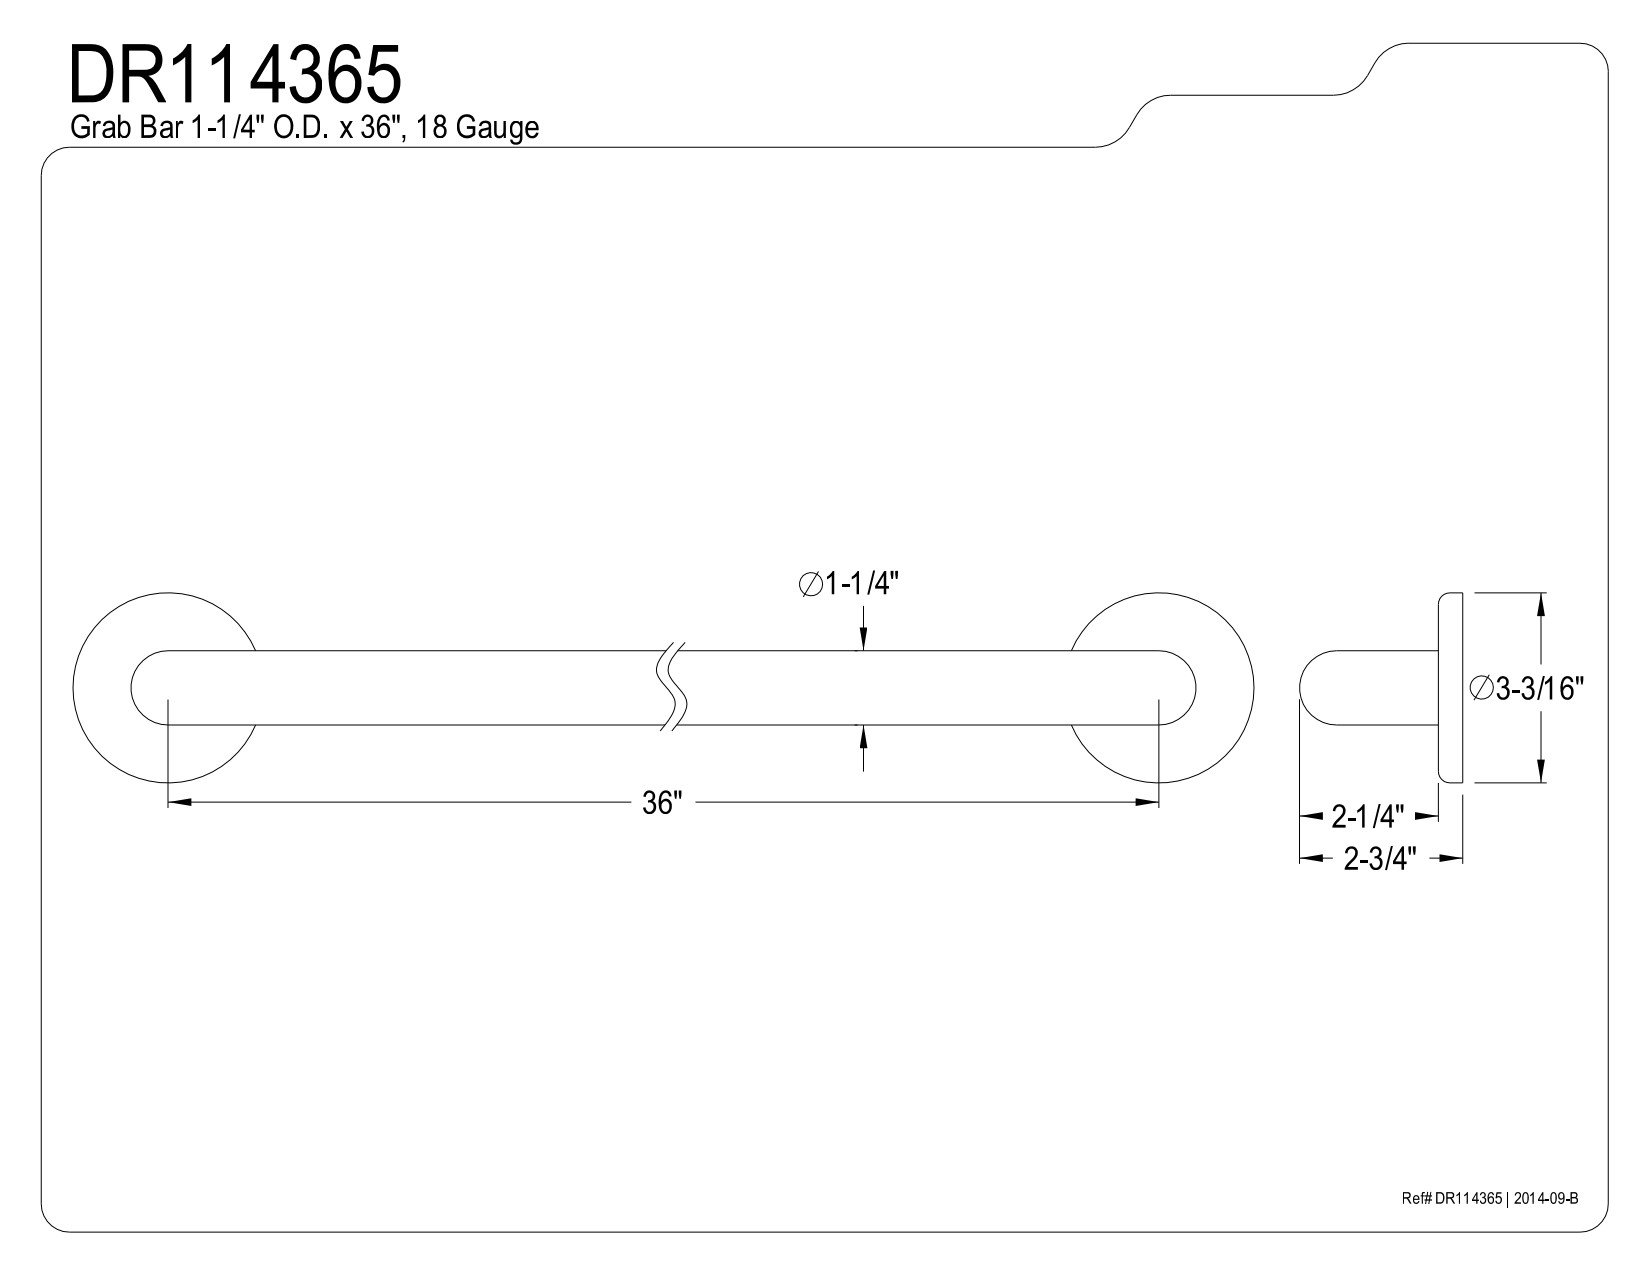 Kingston Brass DR114365 Designer Trimscape Americana Decor 36-Inch Grab Bar with 1.25-Inch Outer Diameter, Oil Rubbed Bronze